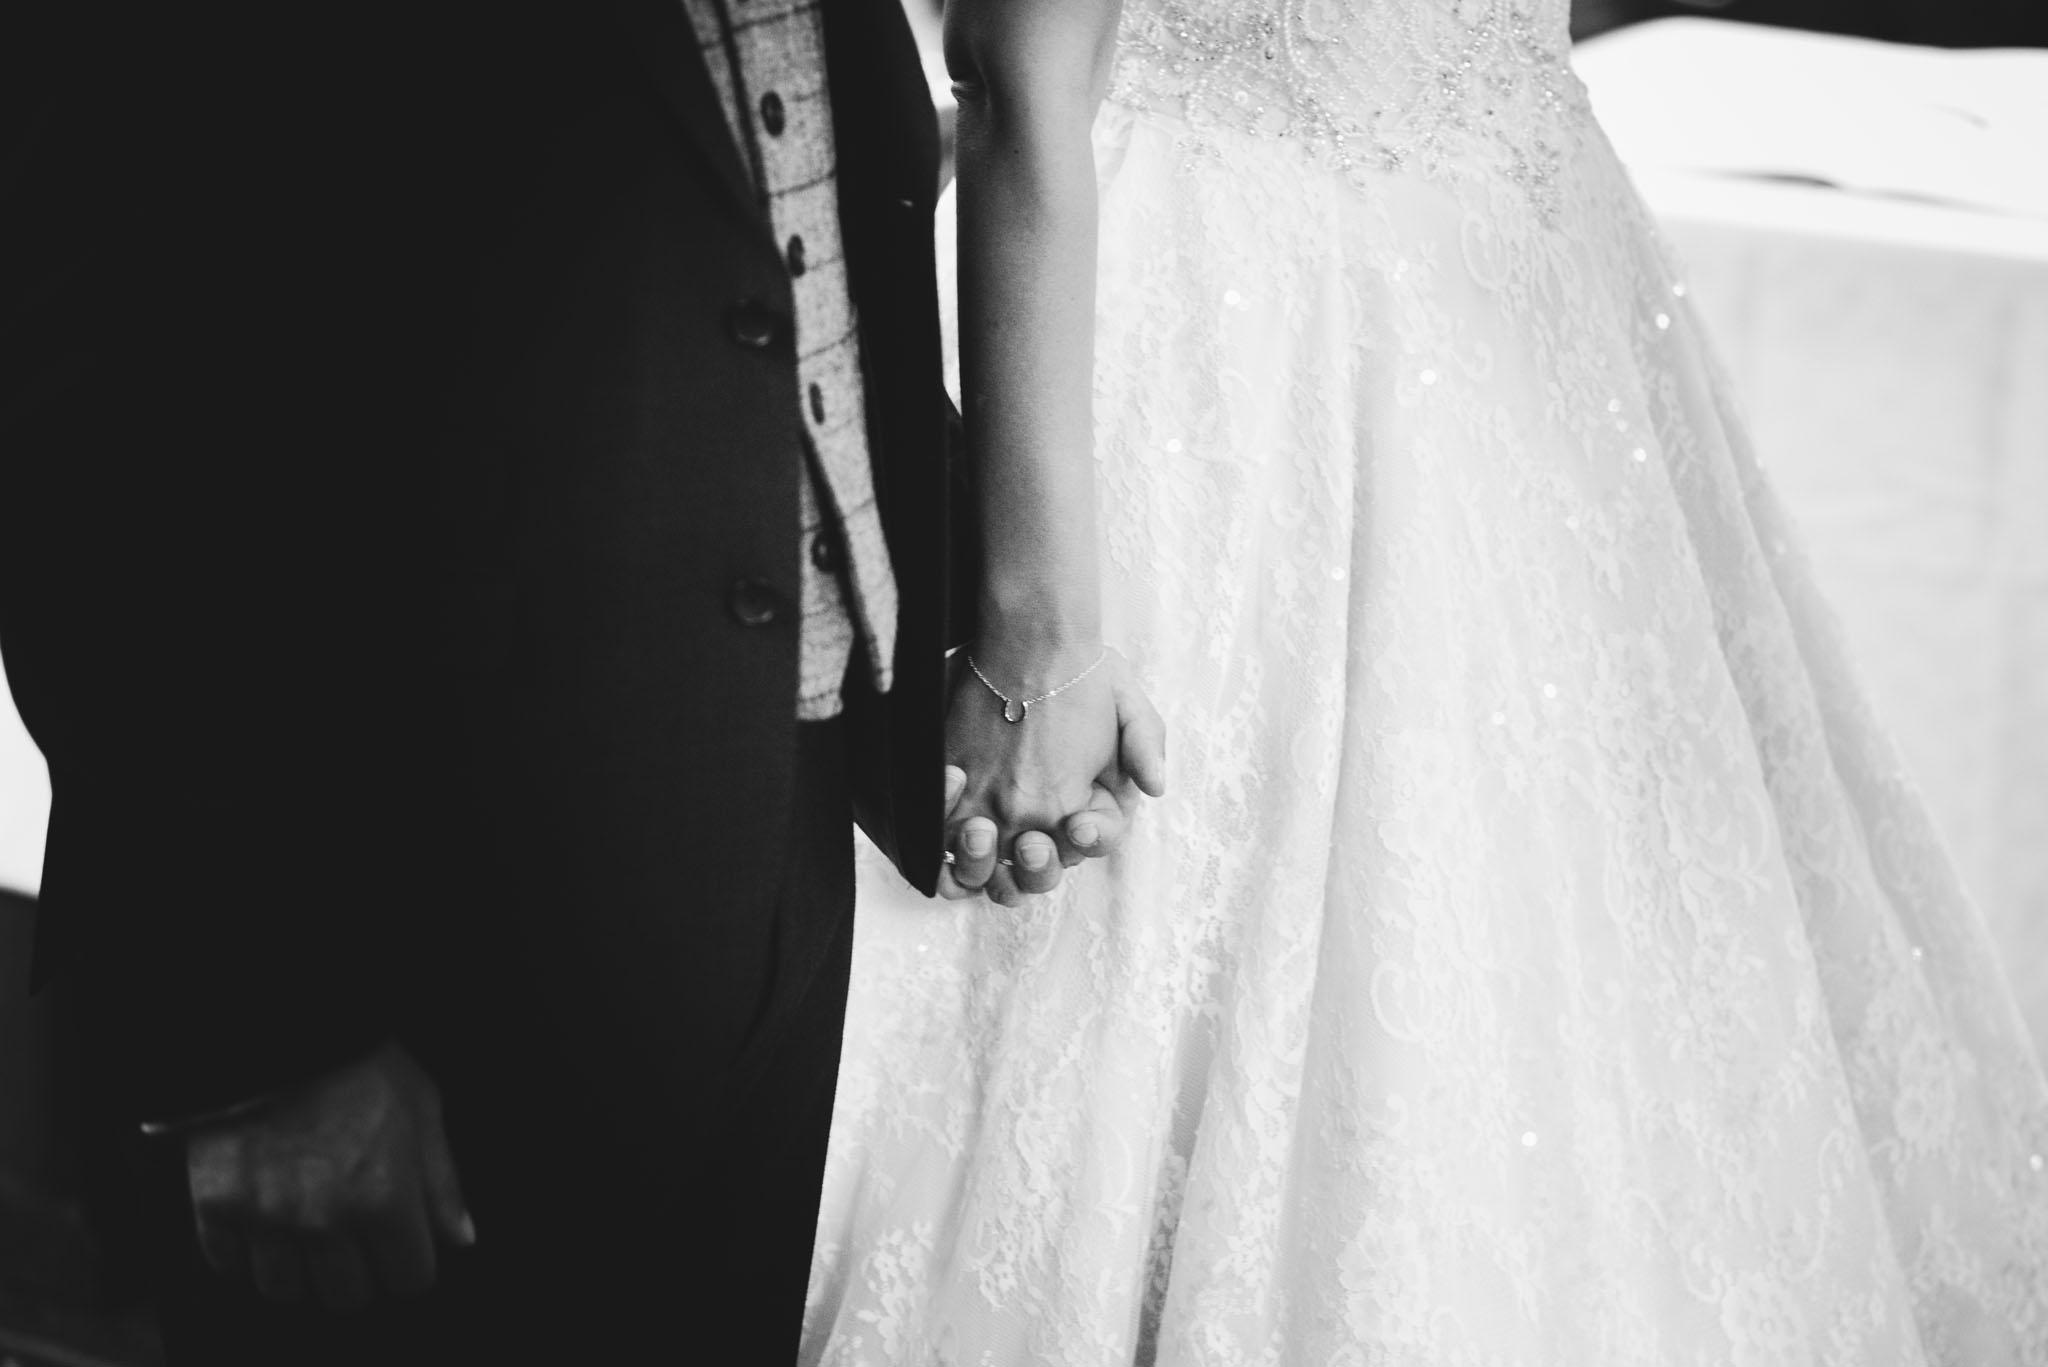 wedding-photographer-glewstone-court-hereford-scott-stockwell-photography199.jpg